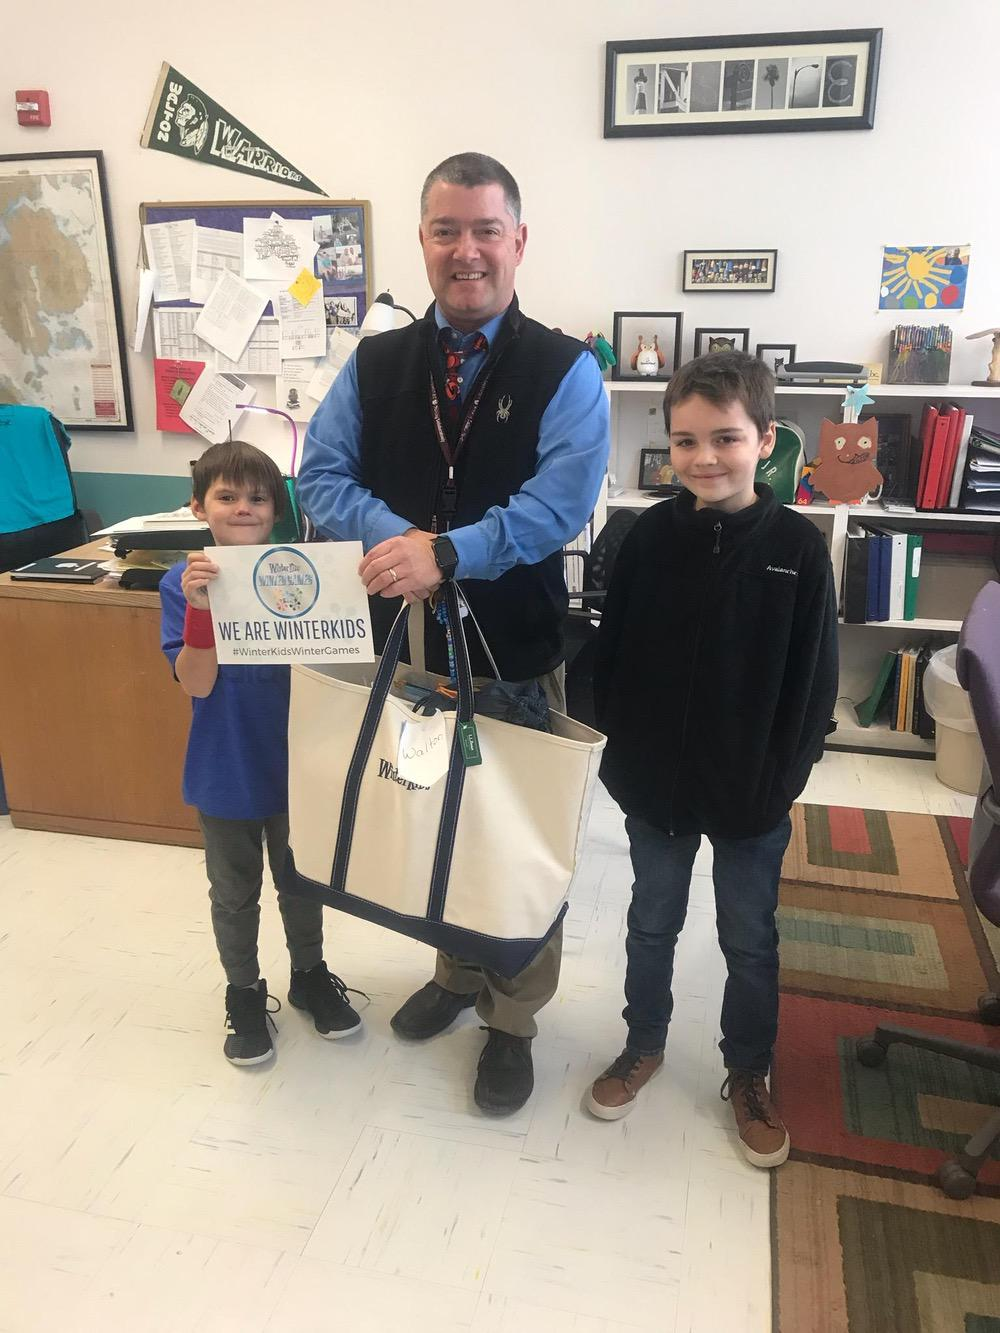 Walton Elementary School Winter Games 2018